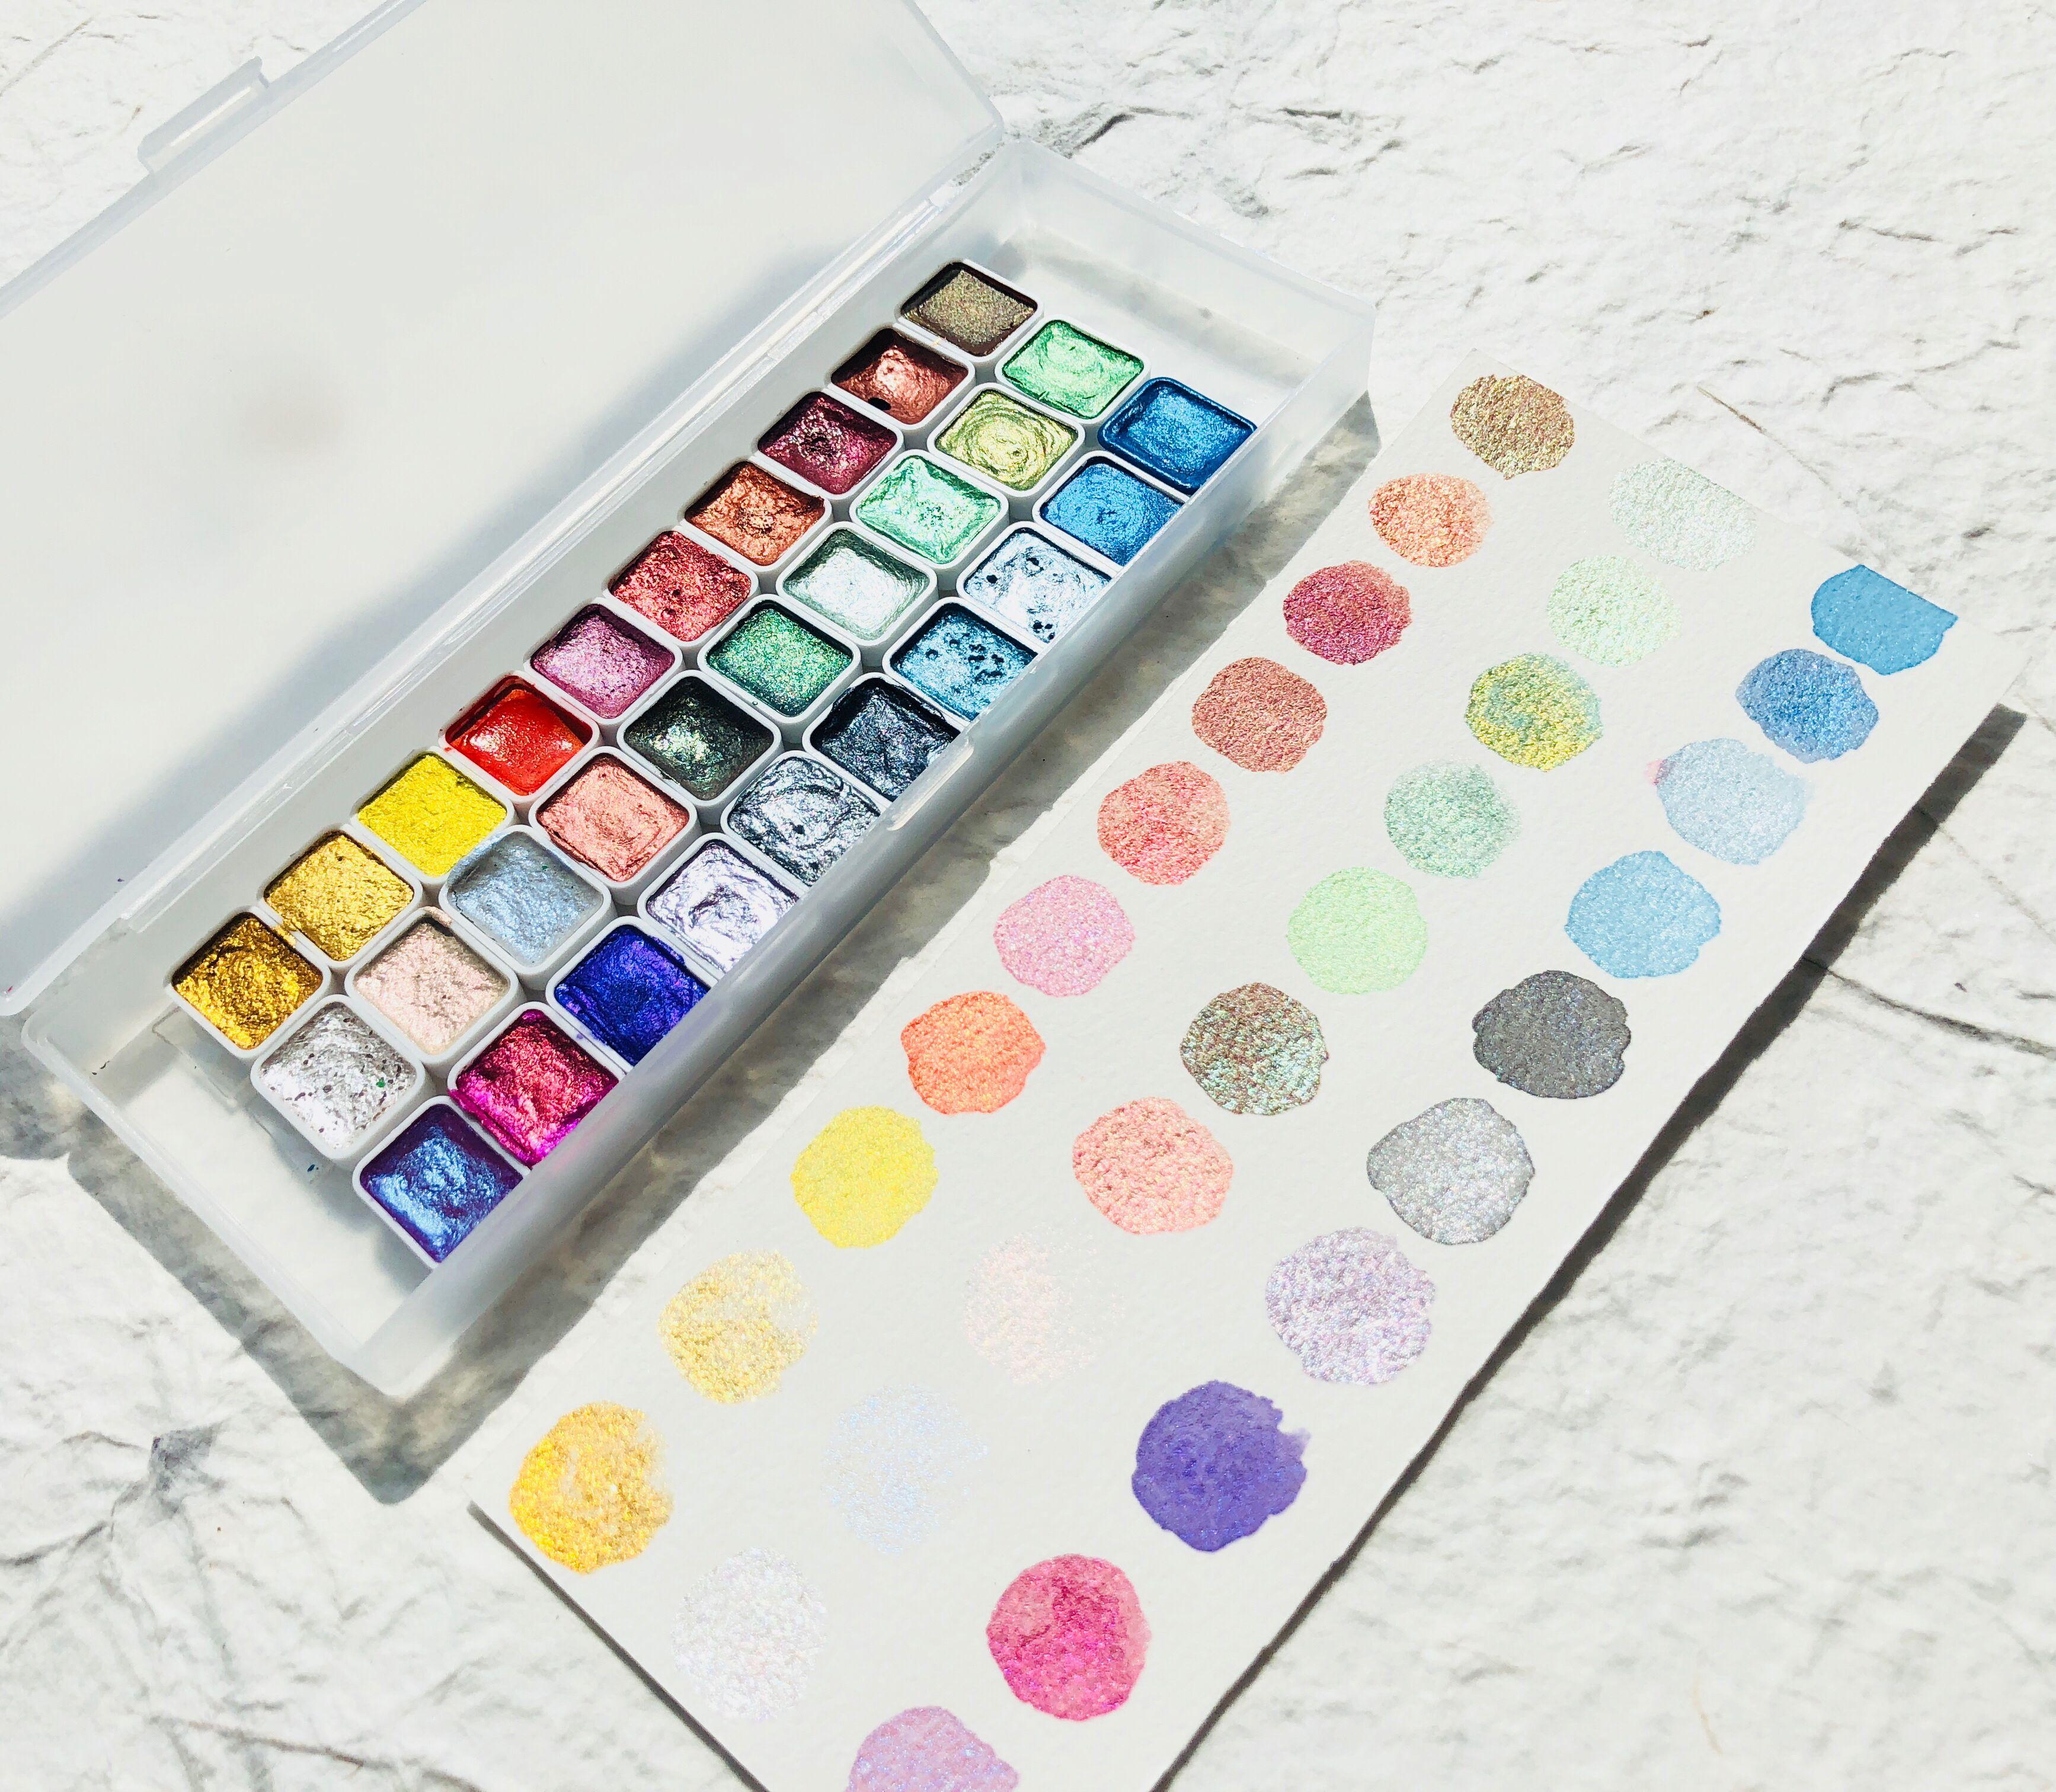 30 Colors Solid Quarter Pans Metallic Pearl Watercolor Paint Set Dropping Handmade Watercolors Nail Art Drawing Acuarelas